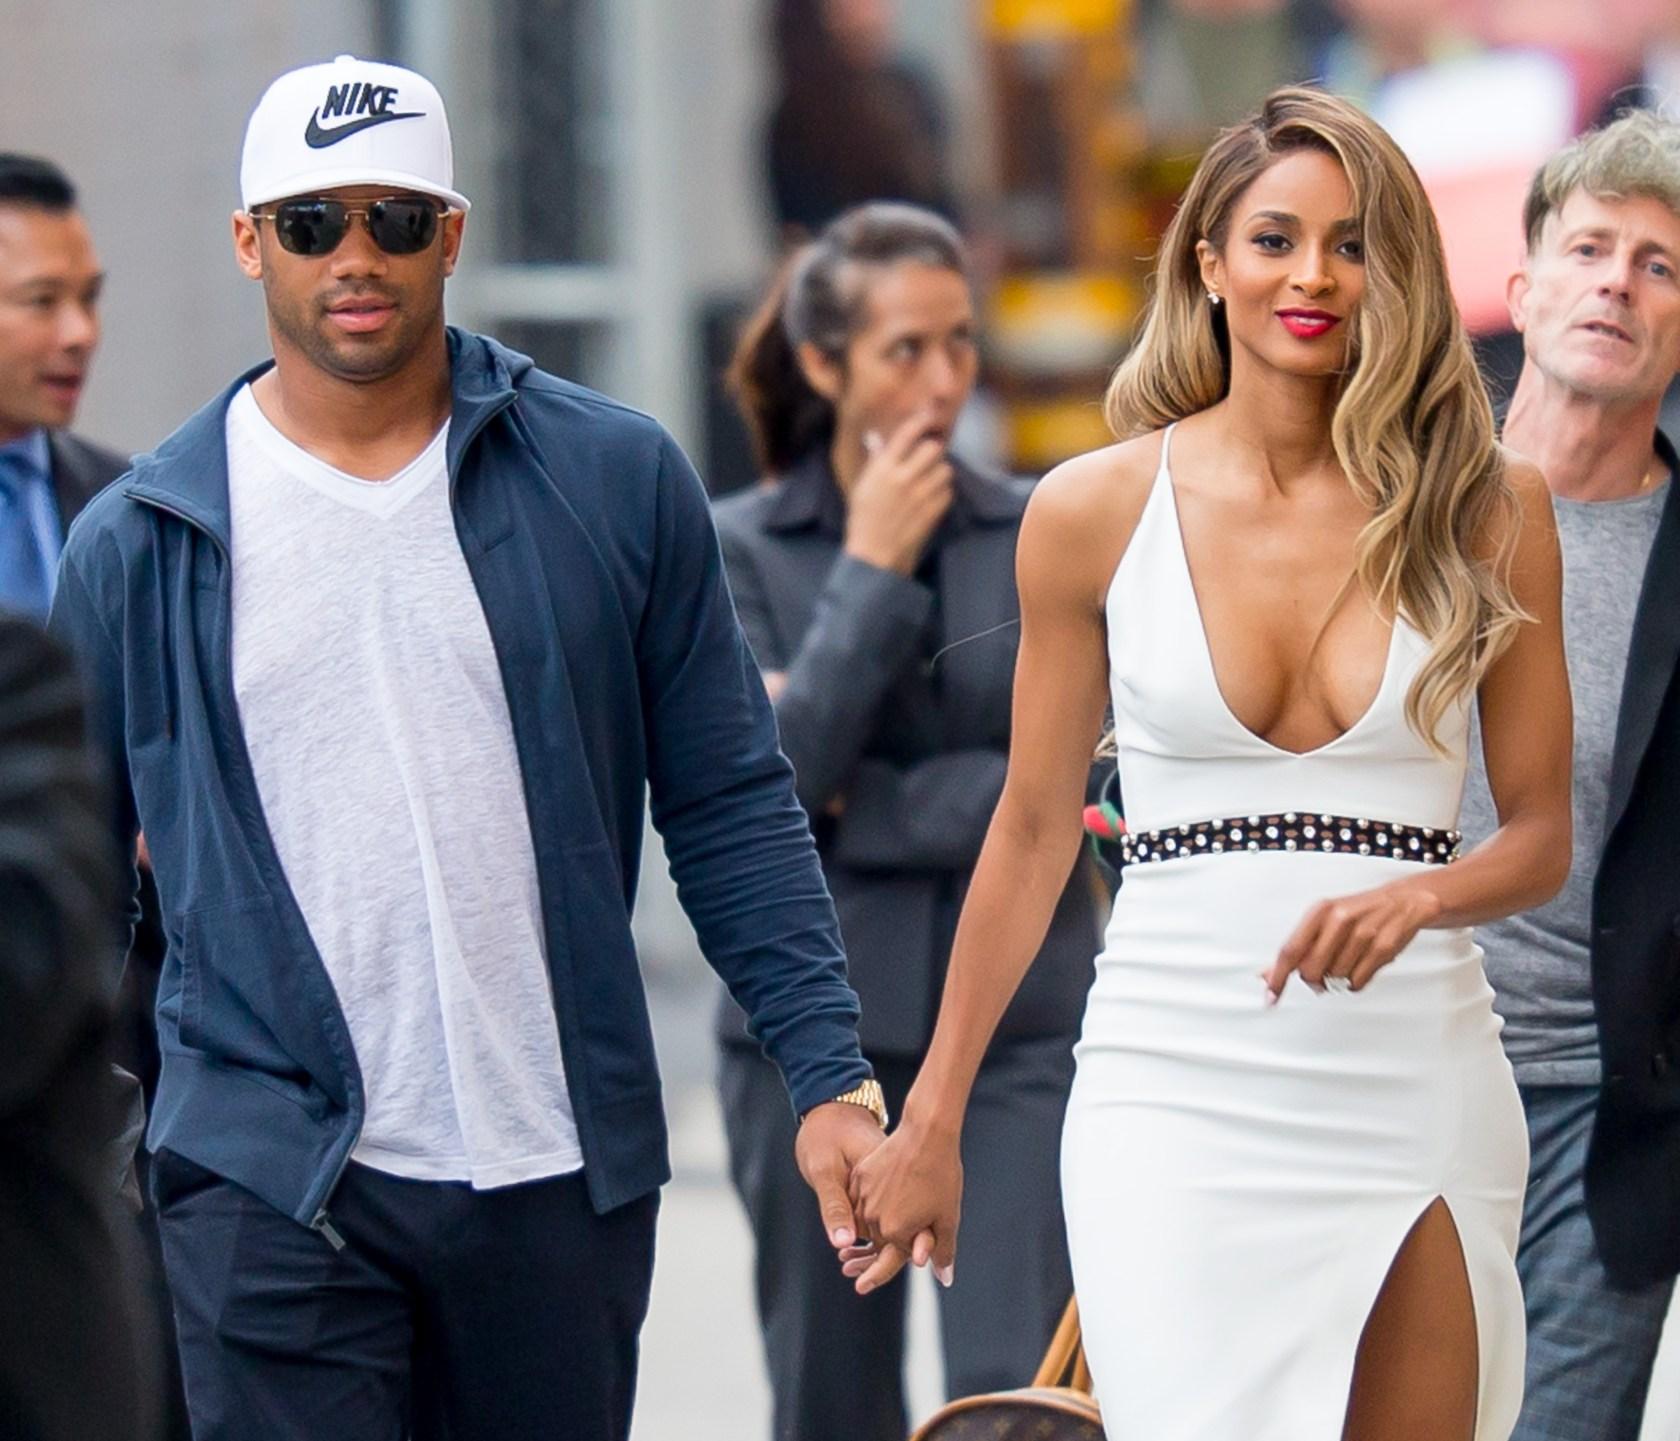 Celebrity Sightings In Los Angeles - May 19, 2016